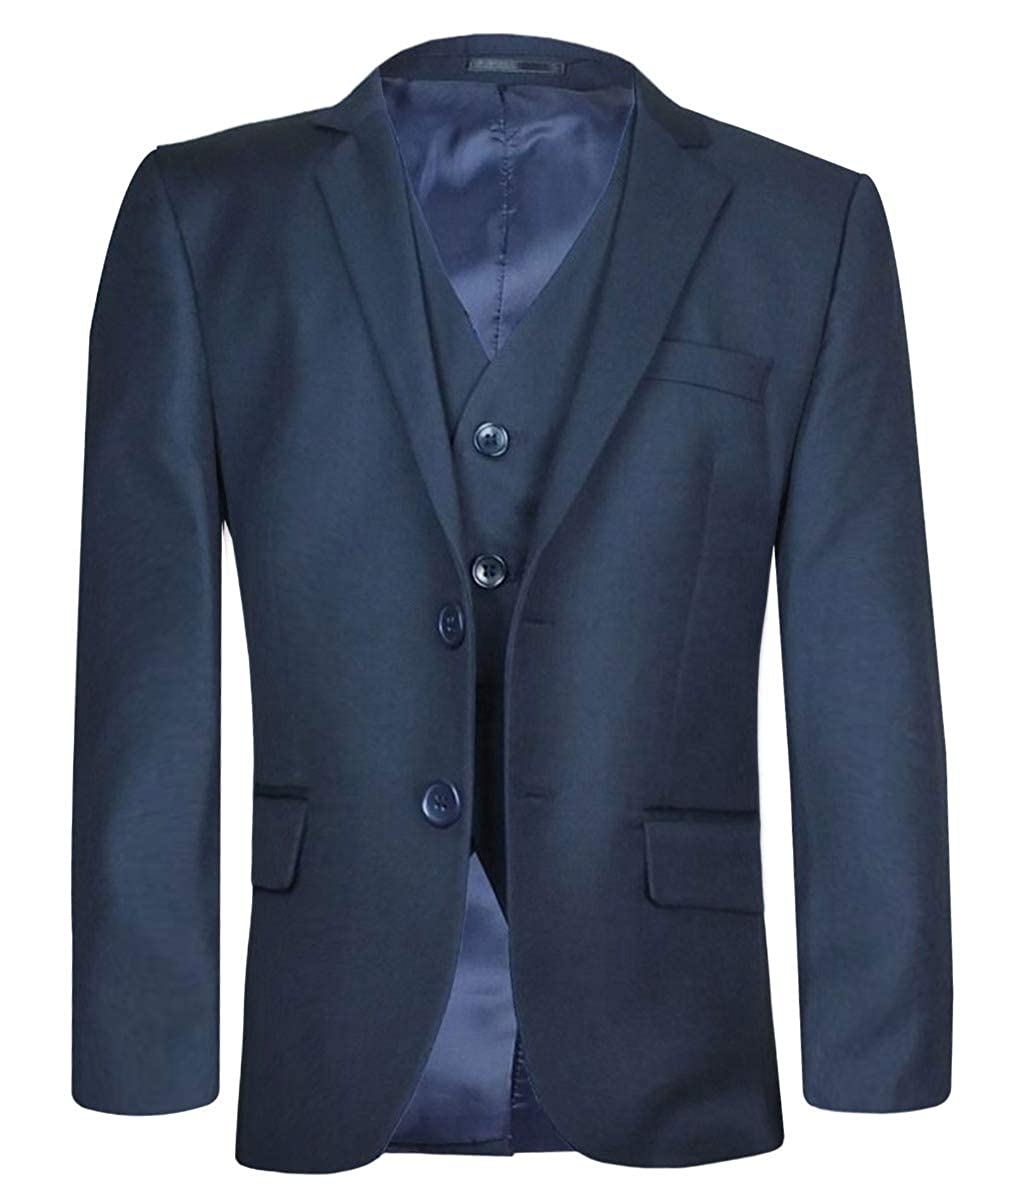 SIRRI Boys Italian Cut Navy Blue Suit Sets